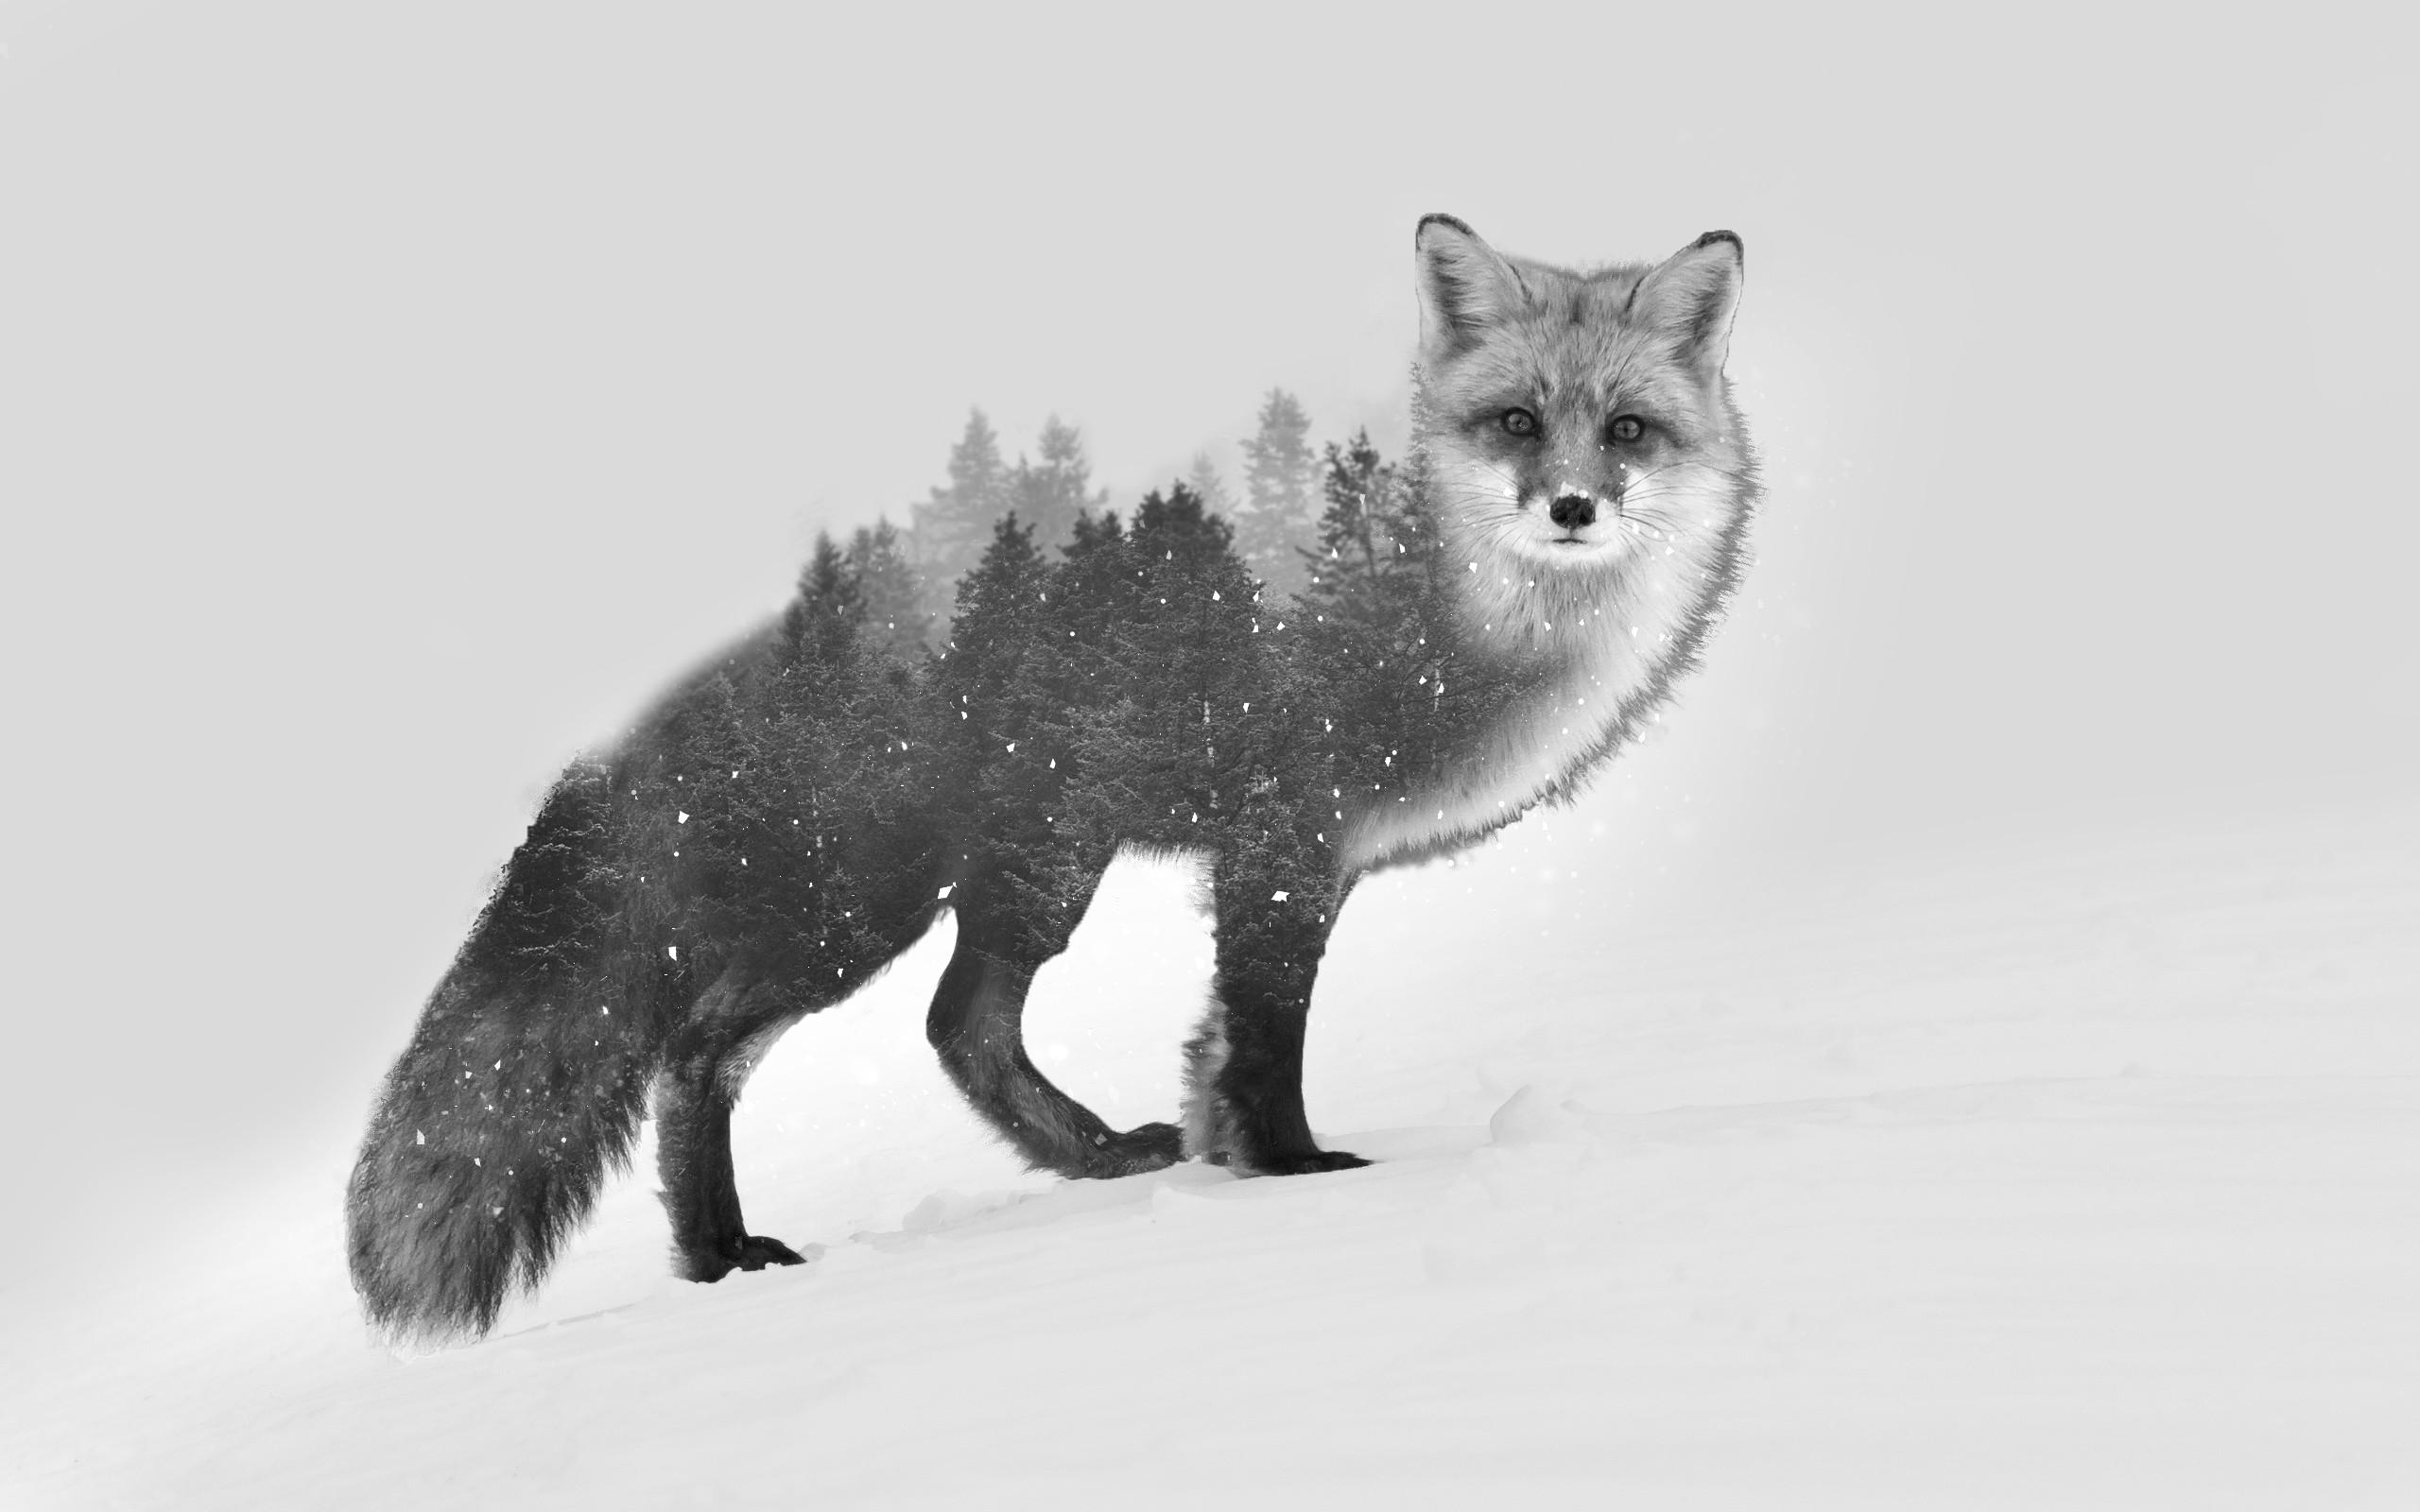 Fondos De Pantalla Arboles Dibujo Bosque Animales Monocromo